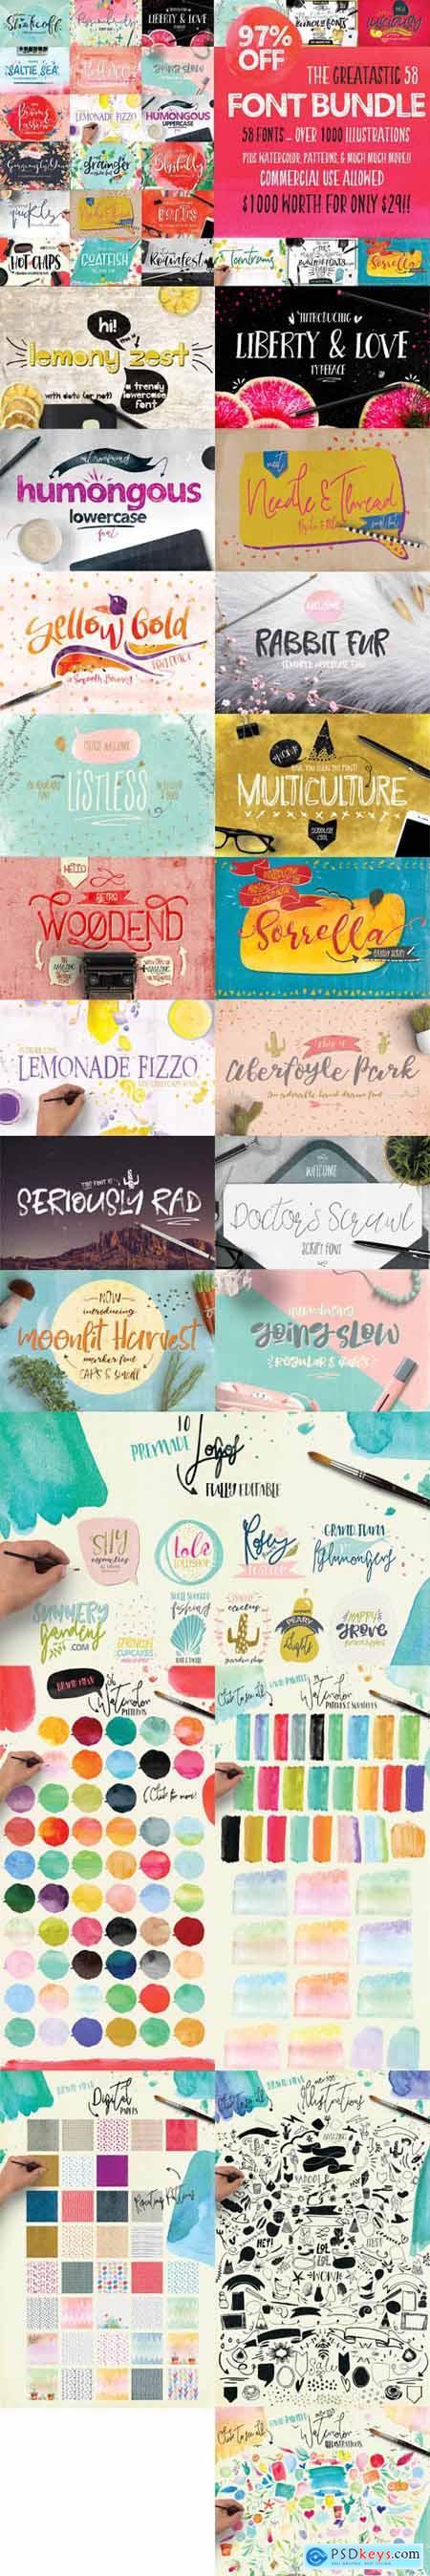 Creativeqube Design Studio - The Greatastic 58 Font Bundle - Over 1000 Illustrations + Patterns